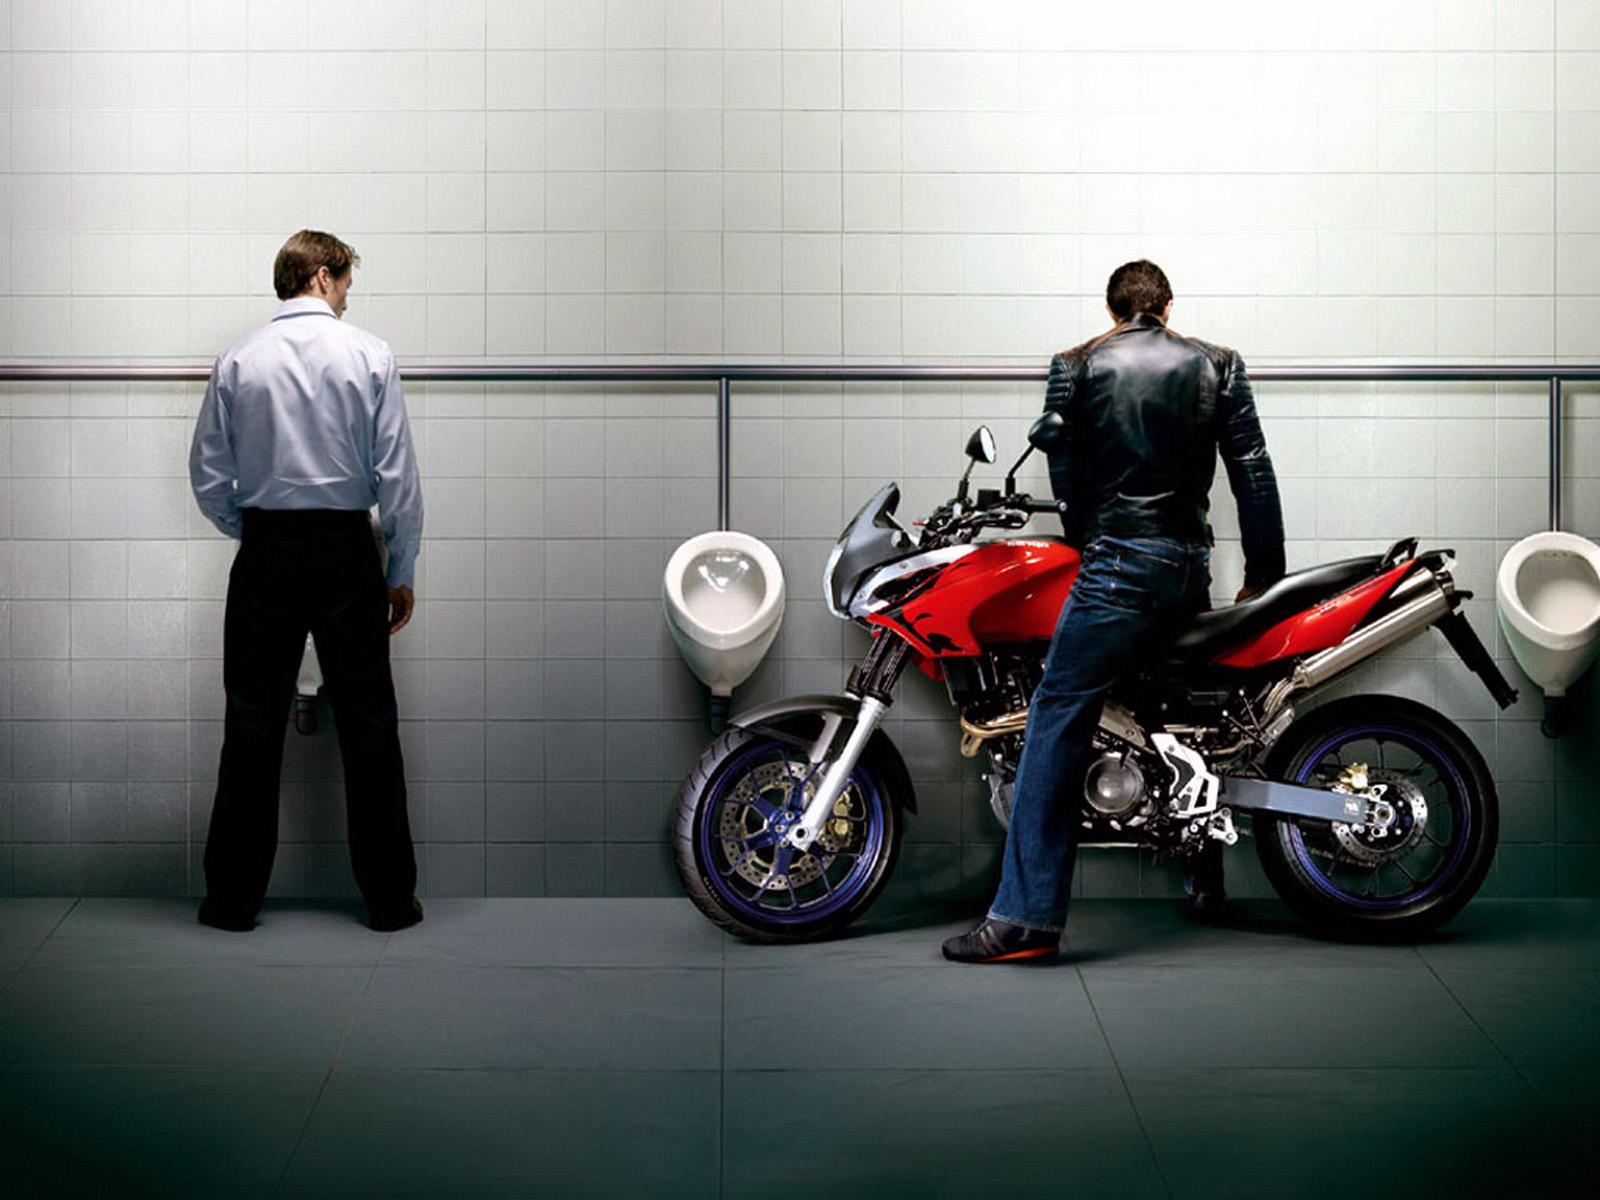 HDoboi.Kiev.ua - Мужик на мотоцикле в туалете, прикольные обои на айфон х